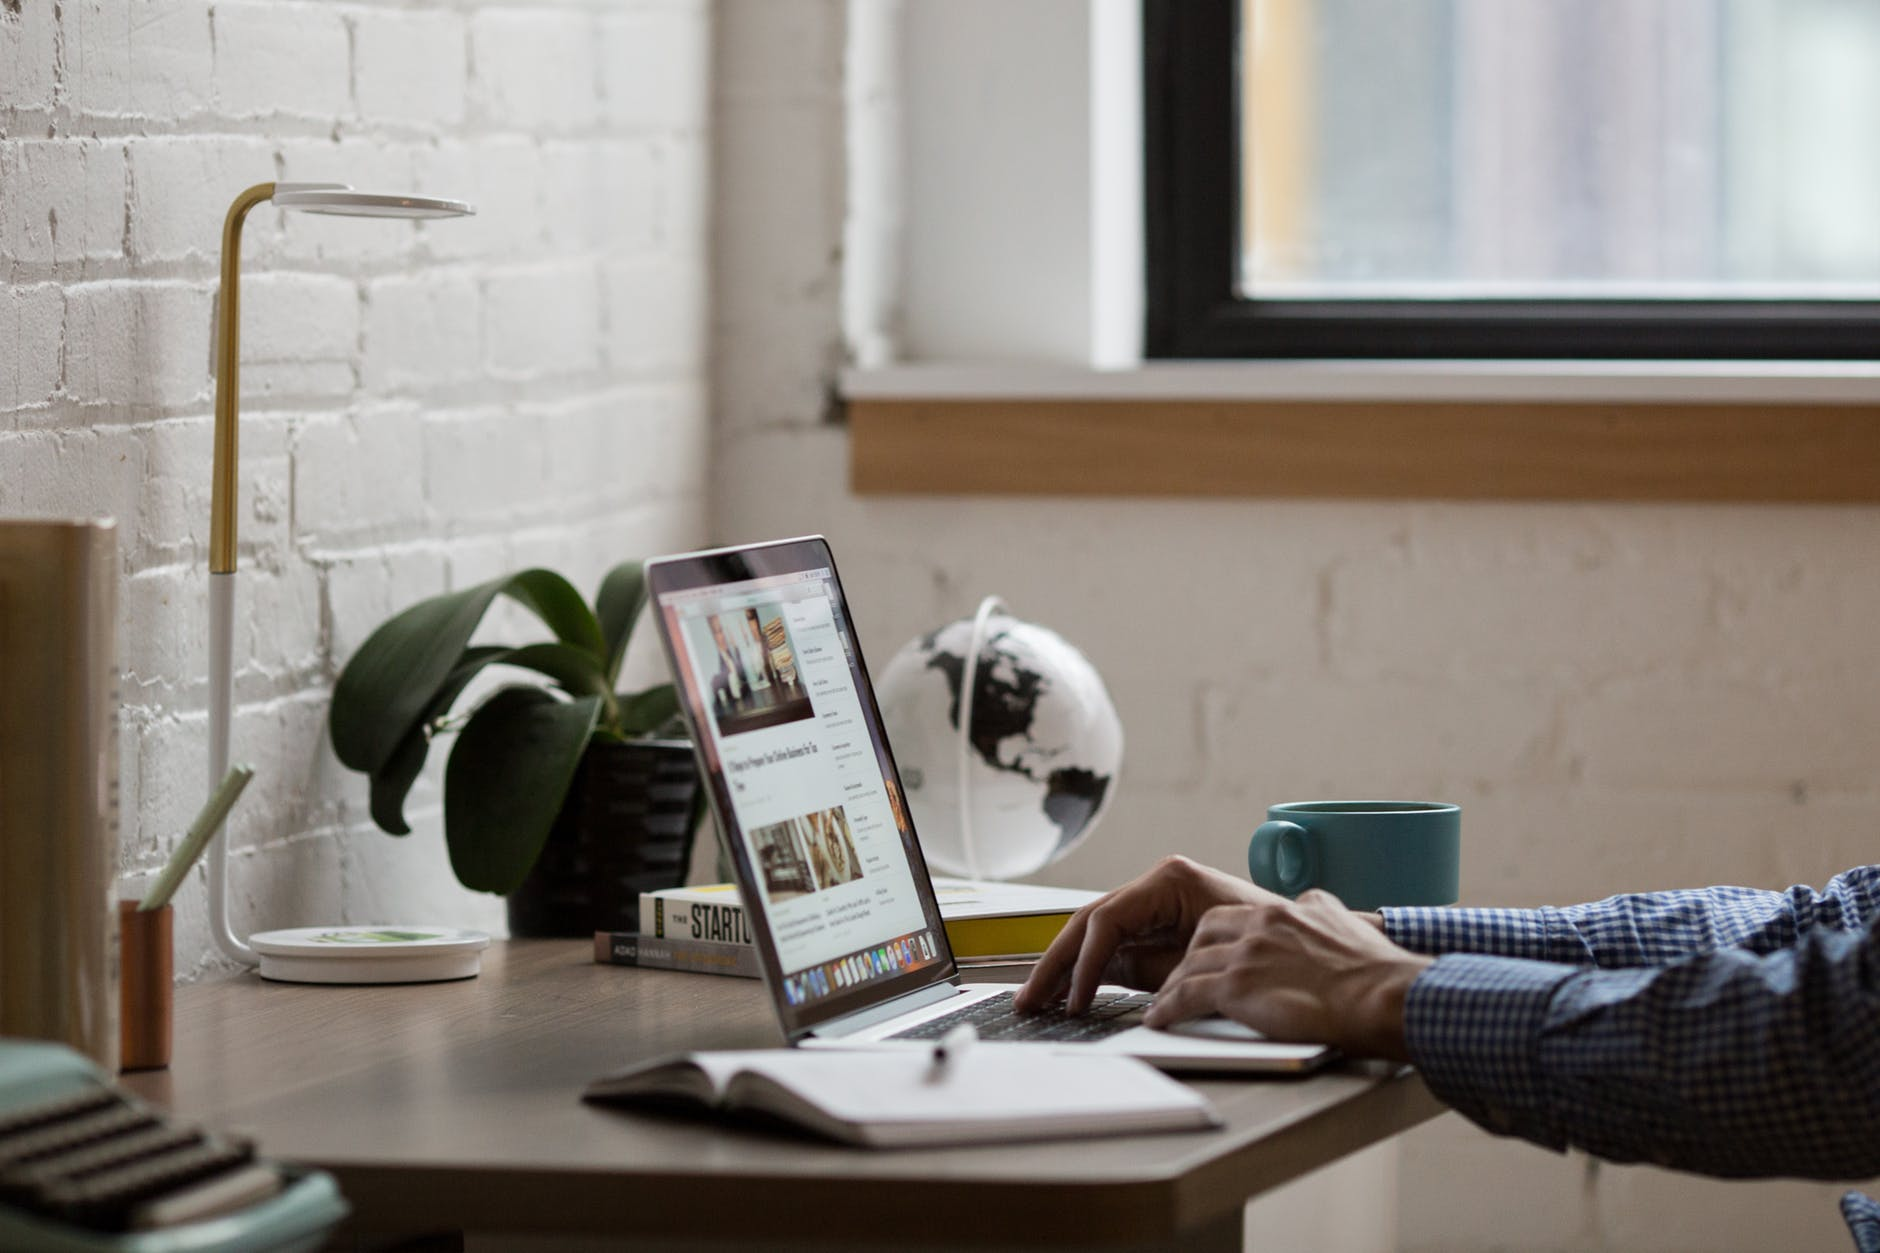 Digital Marketing Strategies to Increase Your Sales Online